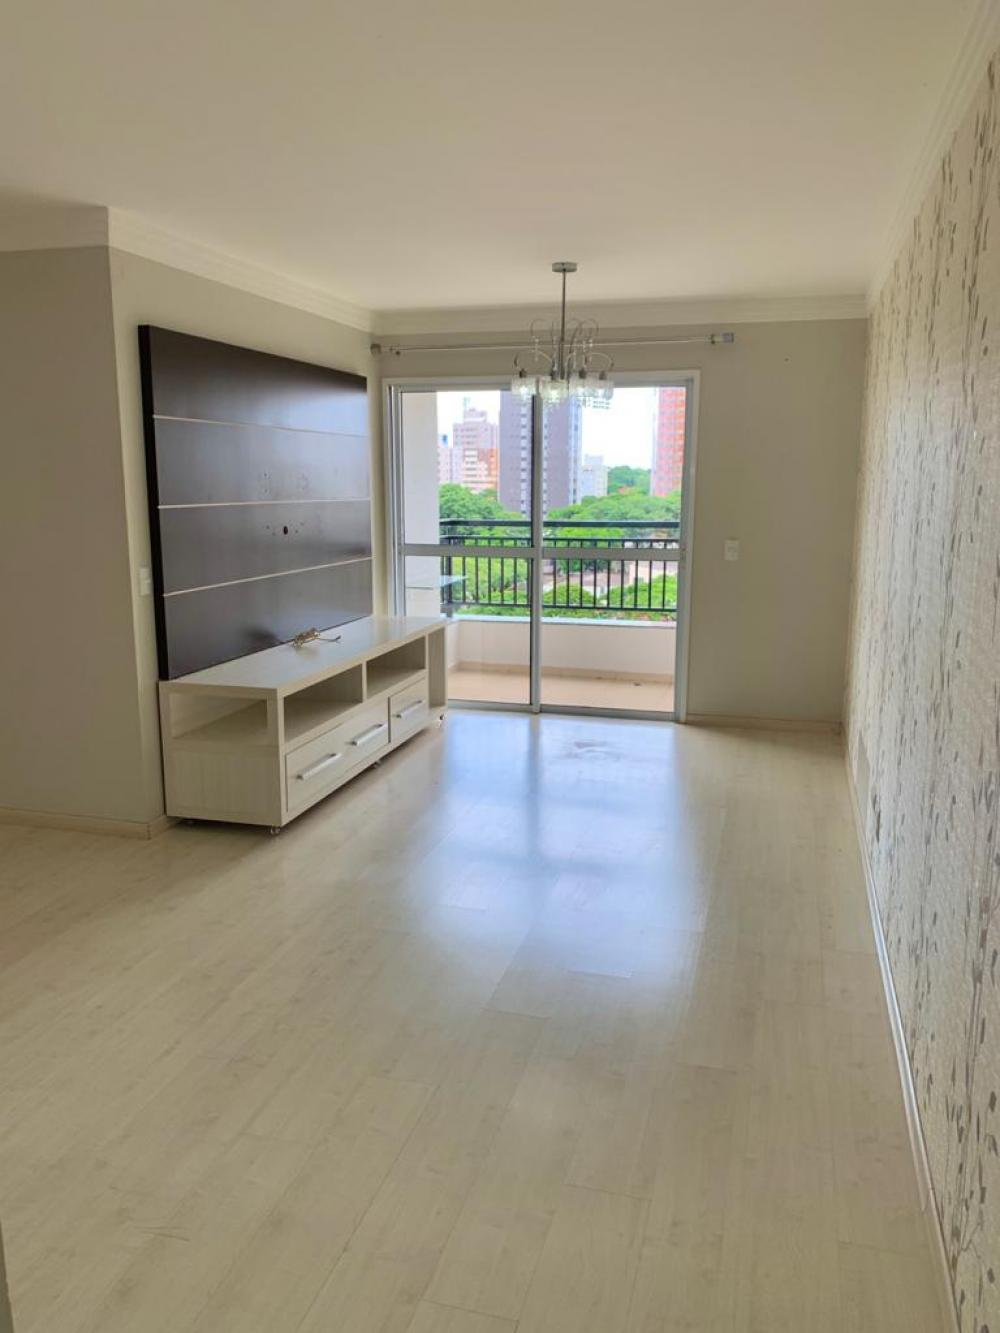 Maringa Apartamento Venda R$435.000,00 Condominio R$400,00 3 Dormitorios 1 Suite Area construida 82.64m2